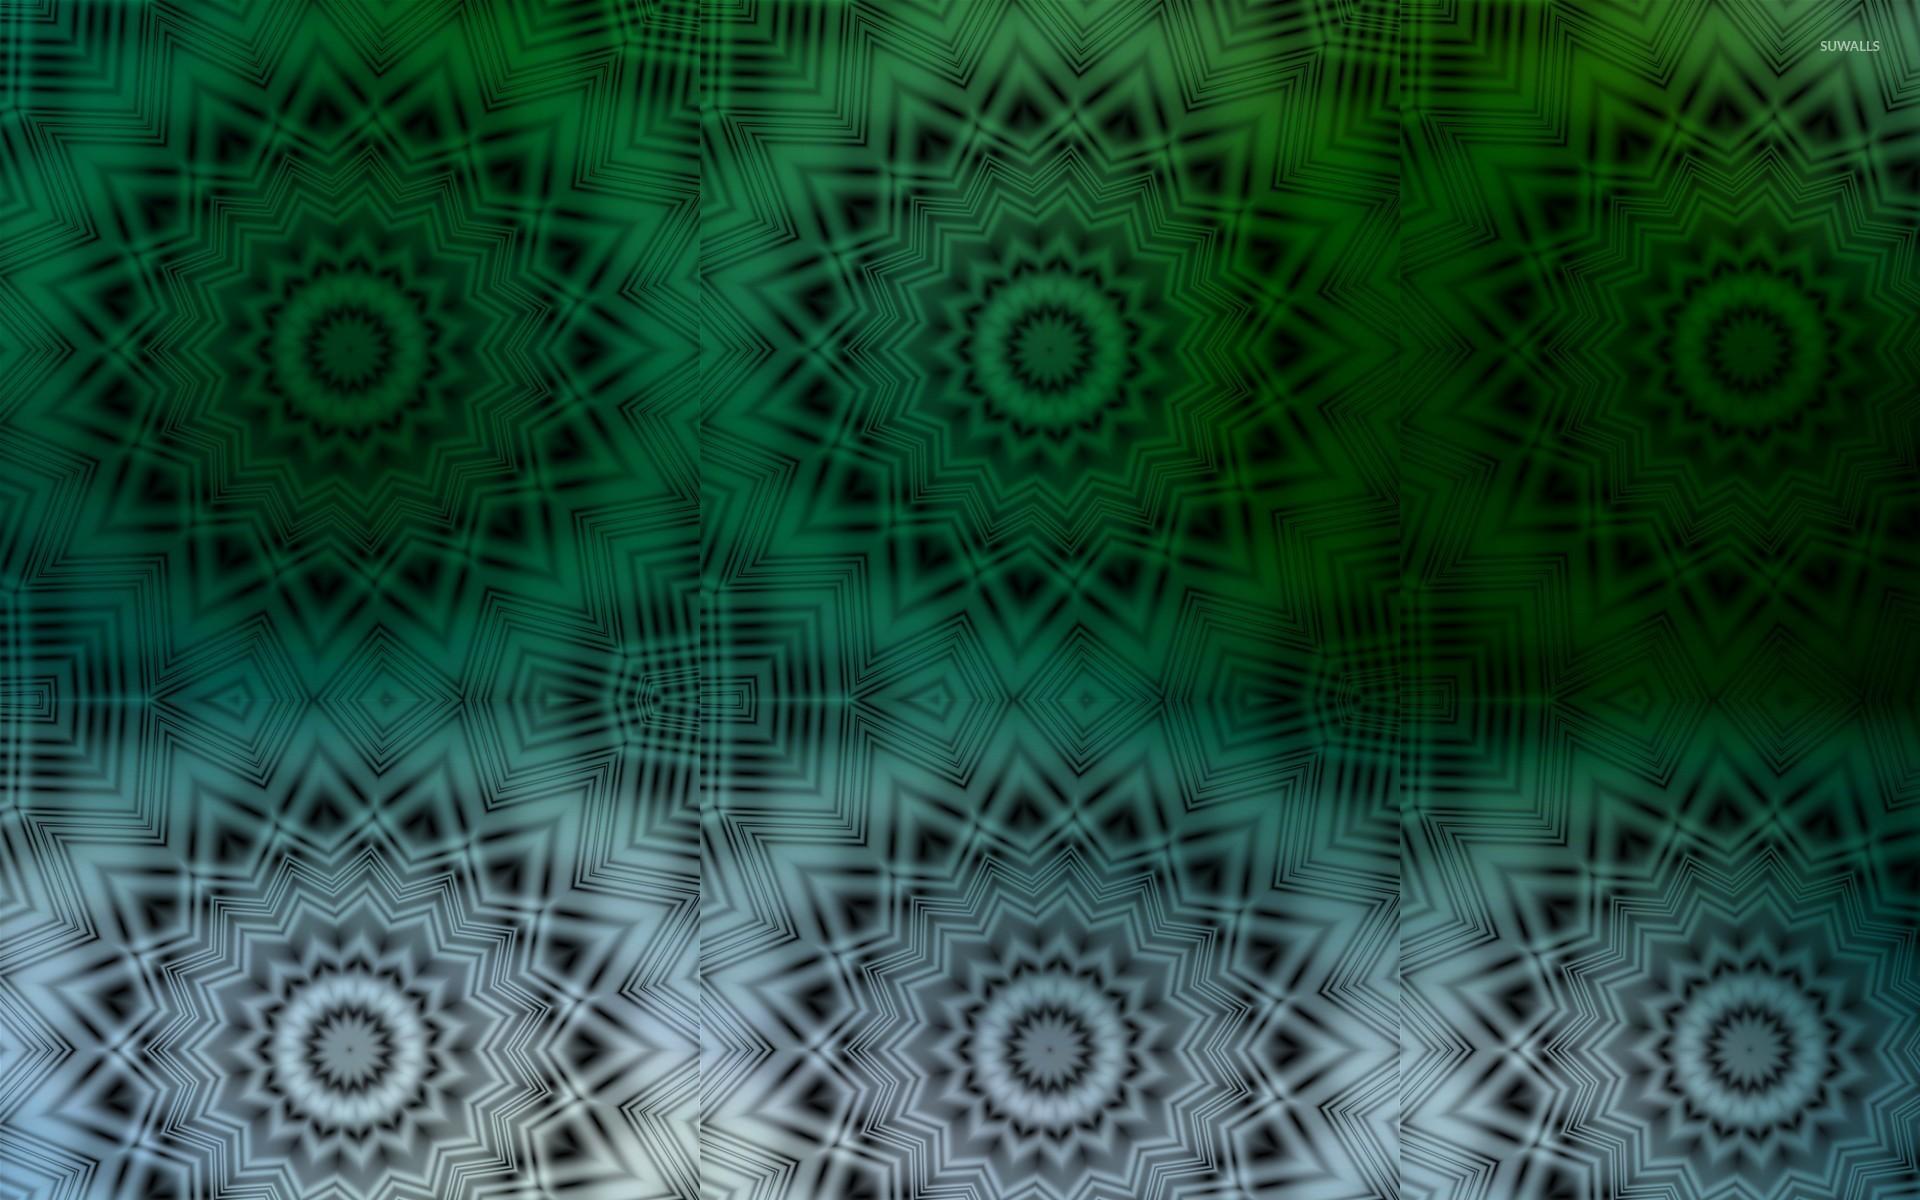 <b>Fractal Shapes Wallpaper</b> 240662 - WallDevil